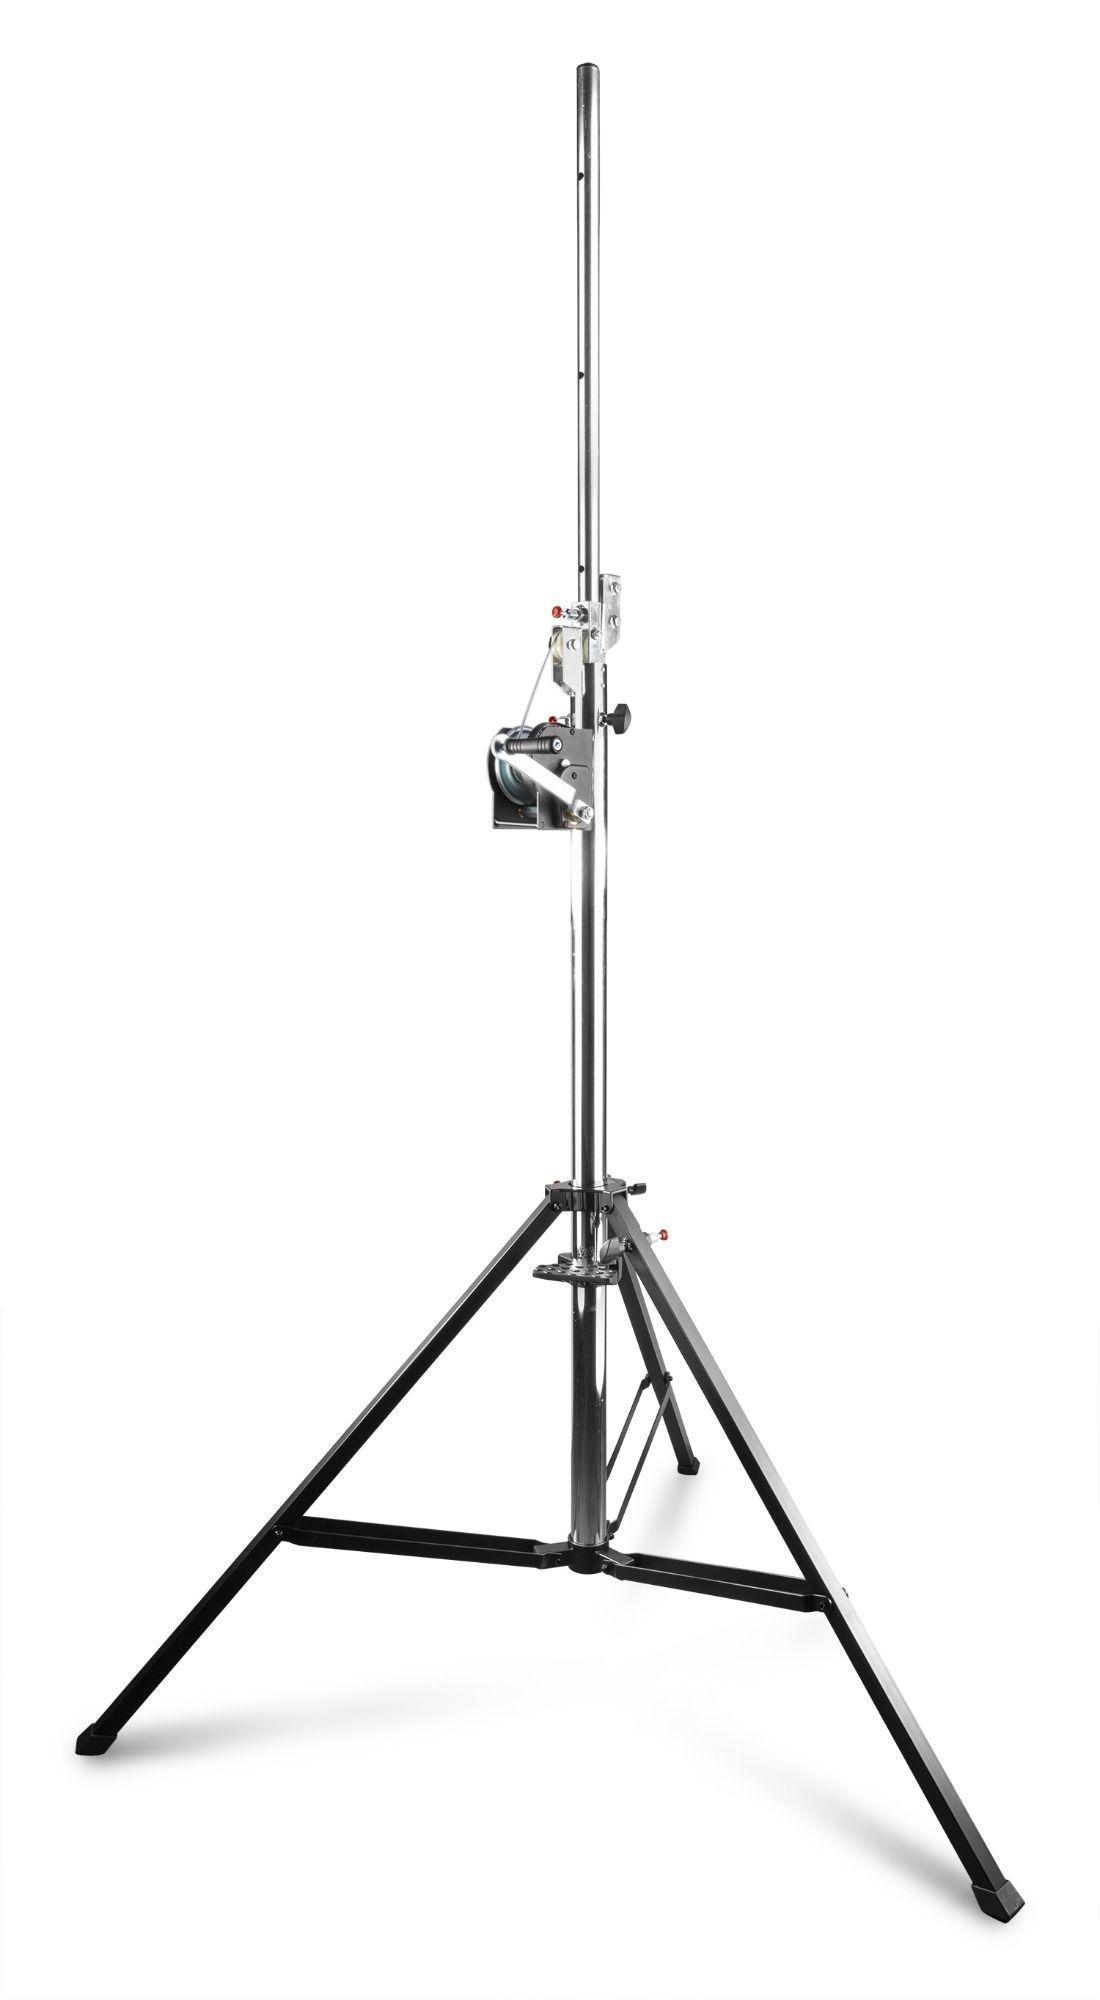 2e keus - BeamZ WLS80 wind-up lichtstandaard - Hoogte 410cm max.